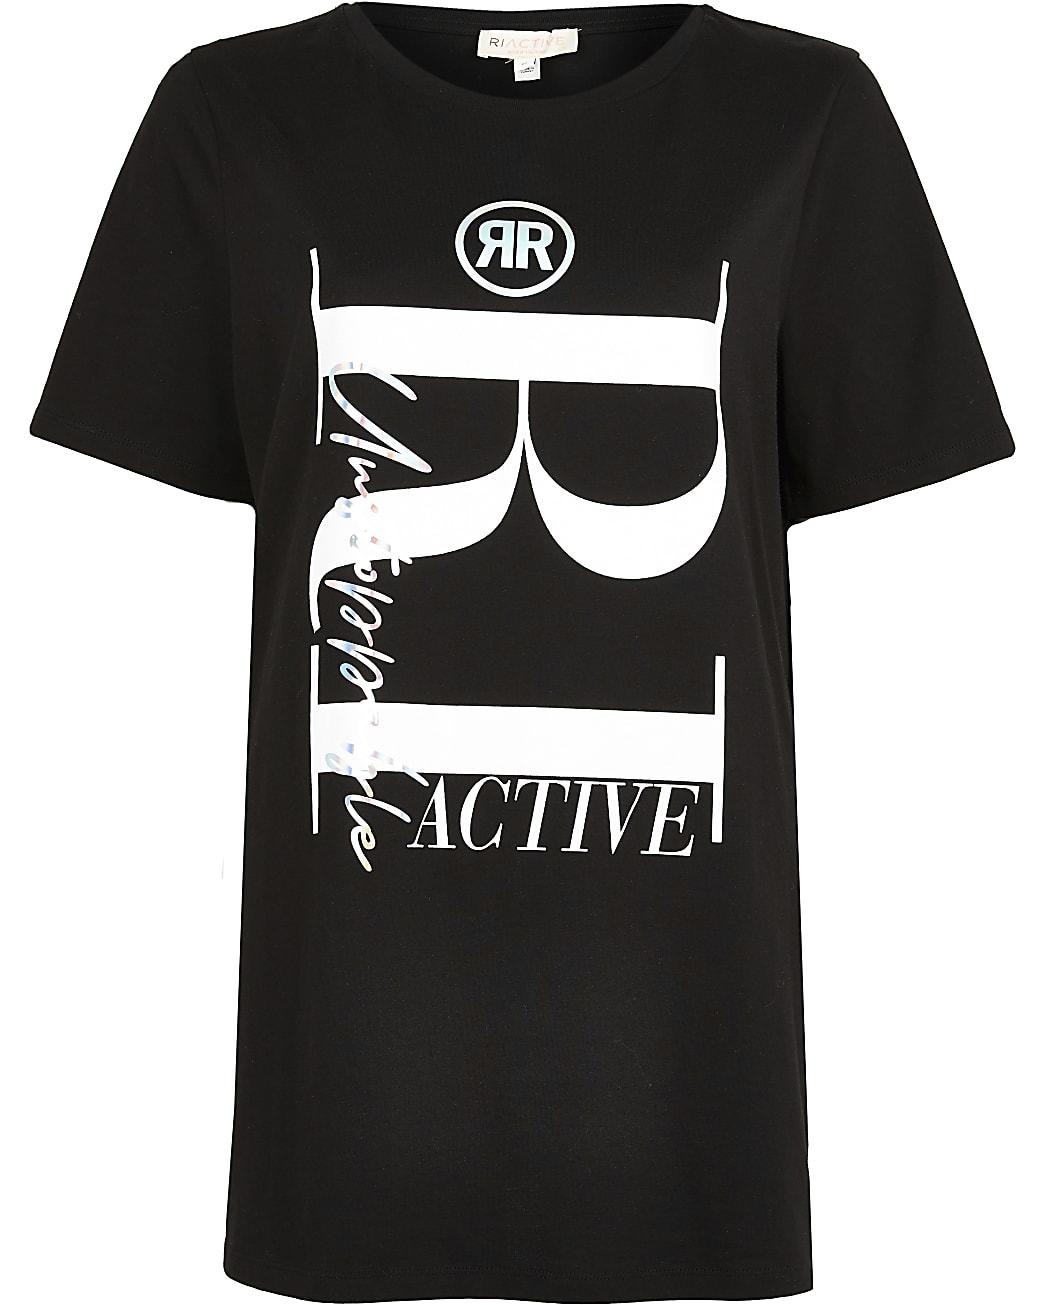 Black RI Active maternity t-shirt